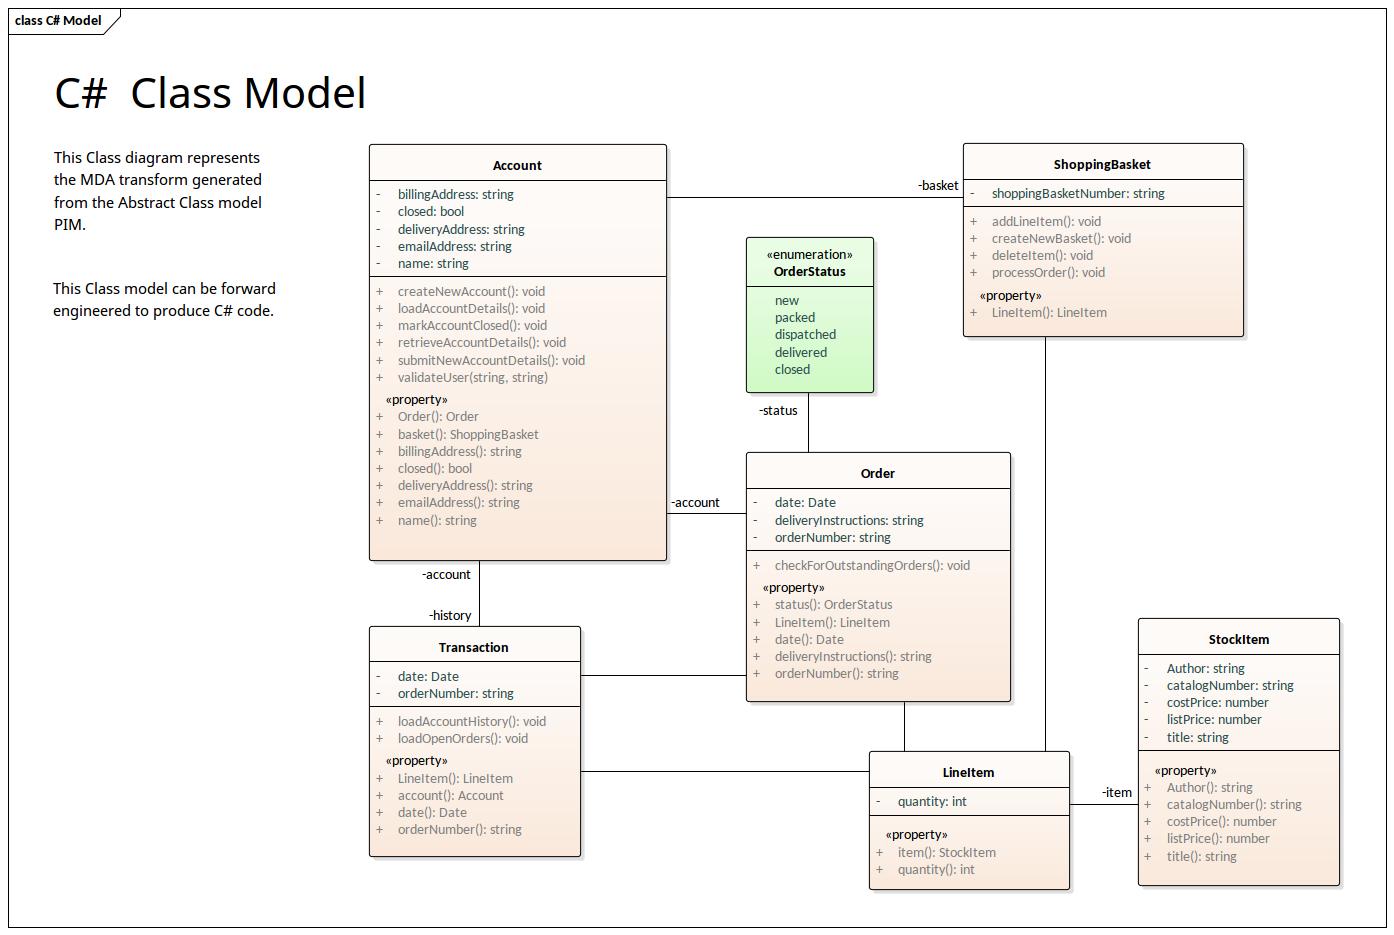 C# Class Diagram | Enterprise Architect Diagrams Gallery